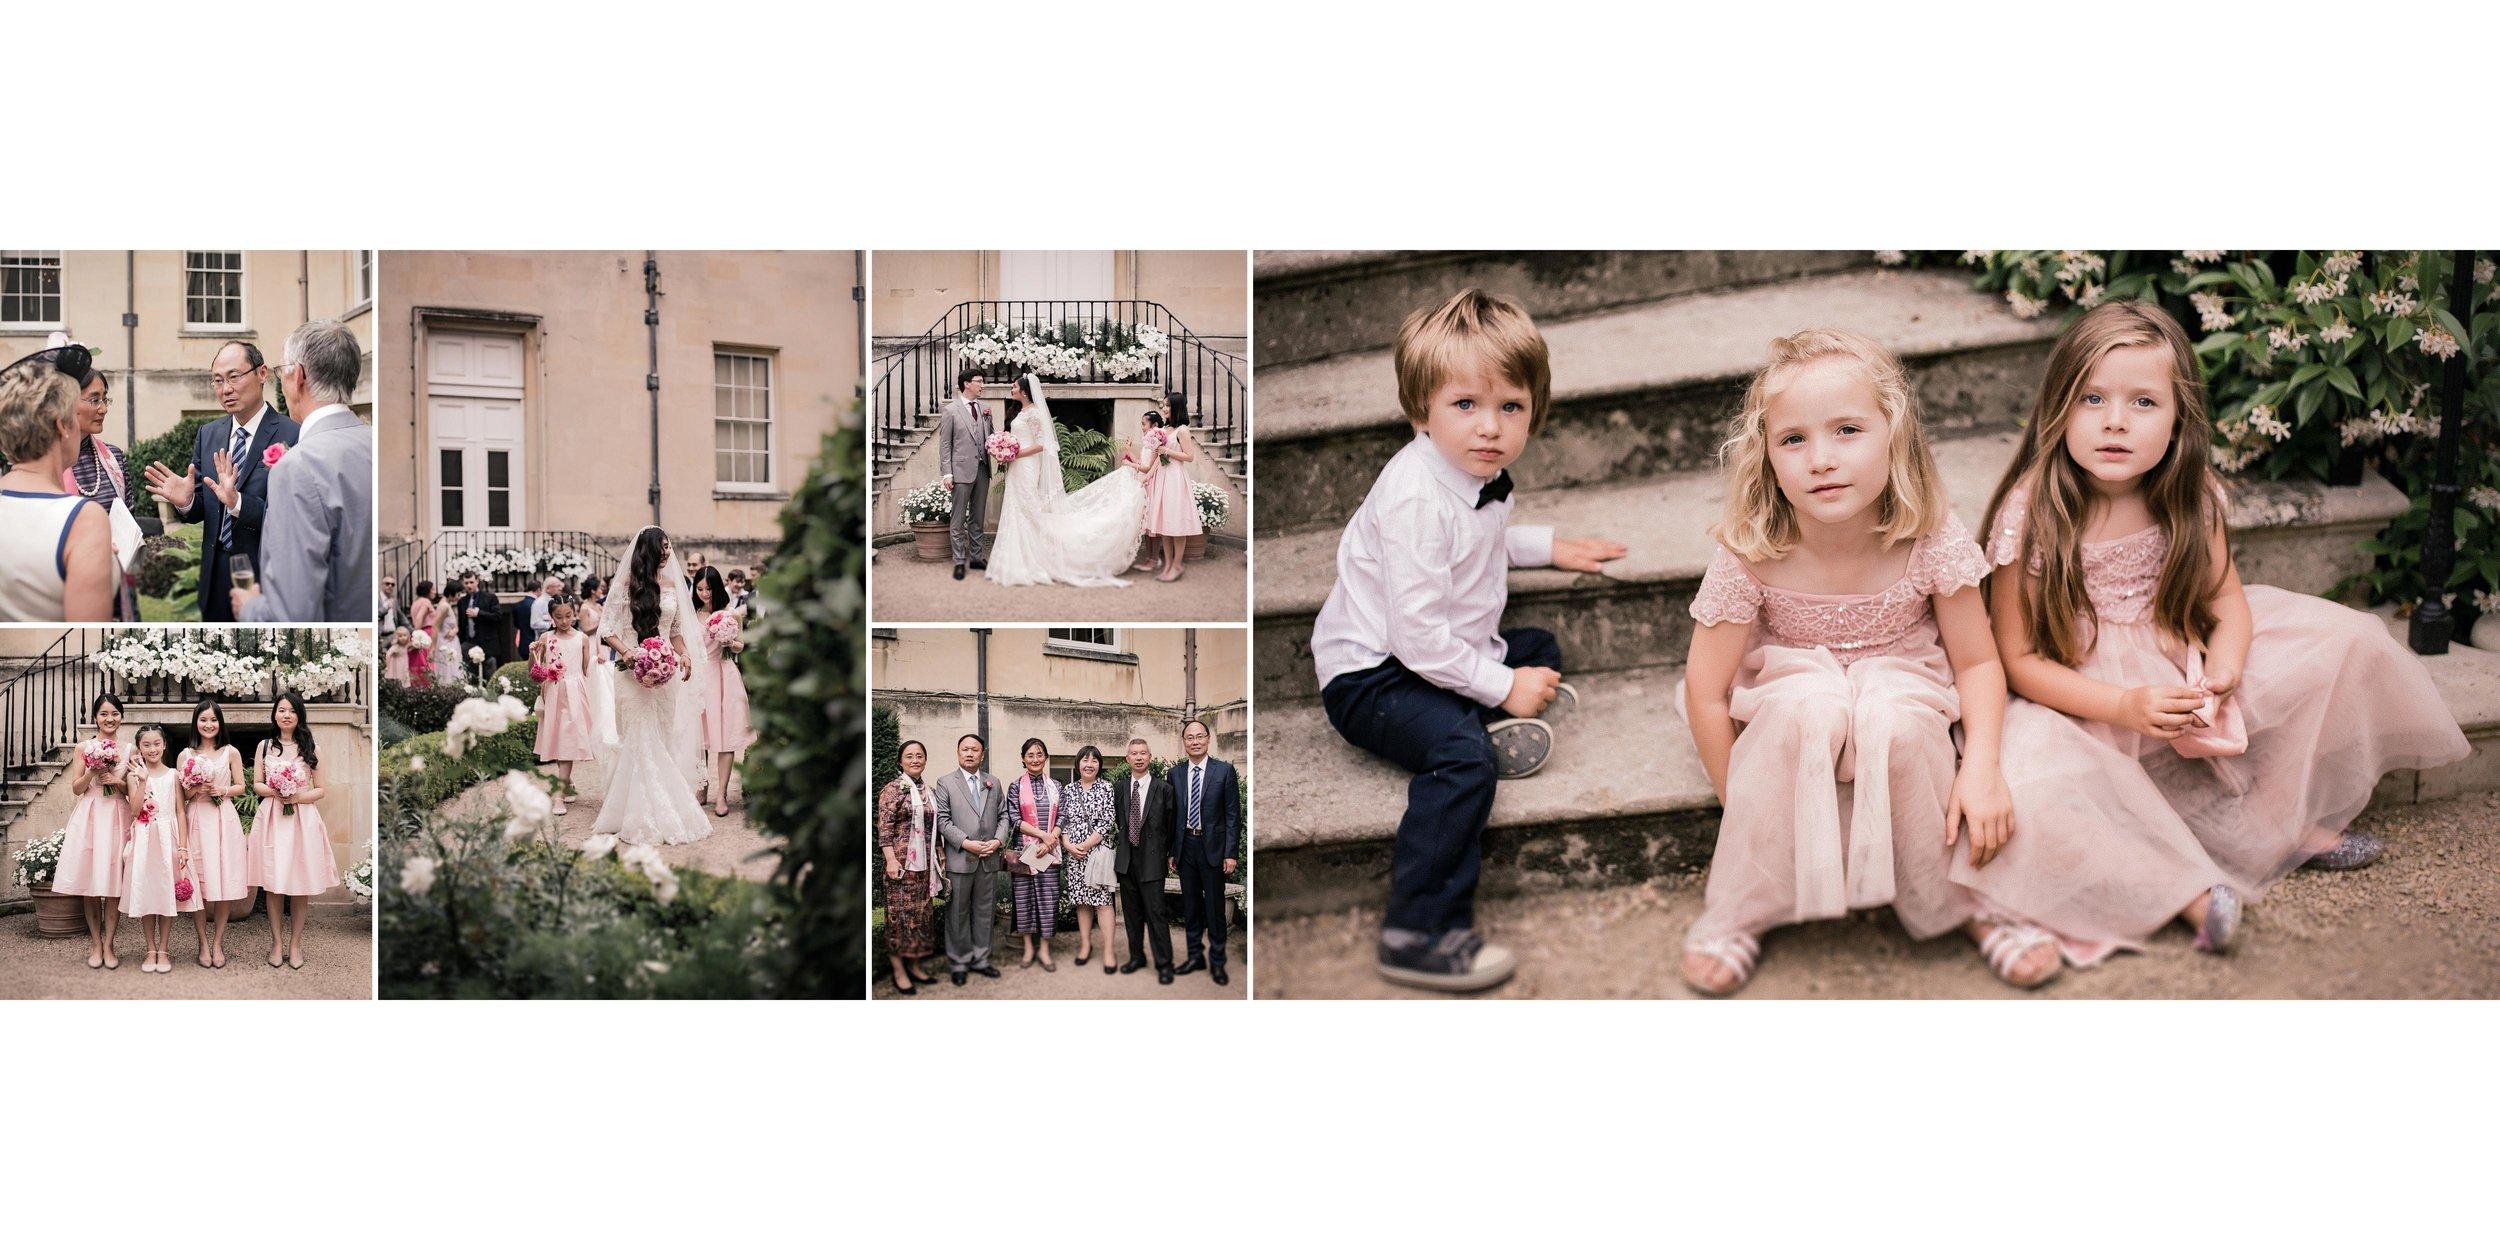 wedding_photographer_surrey_40.jpg